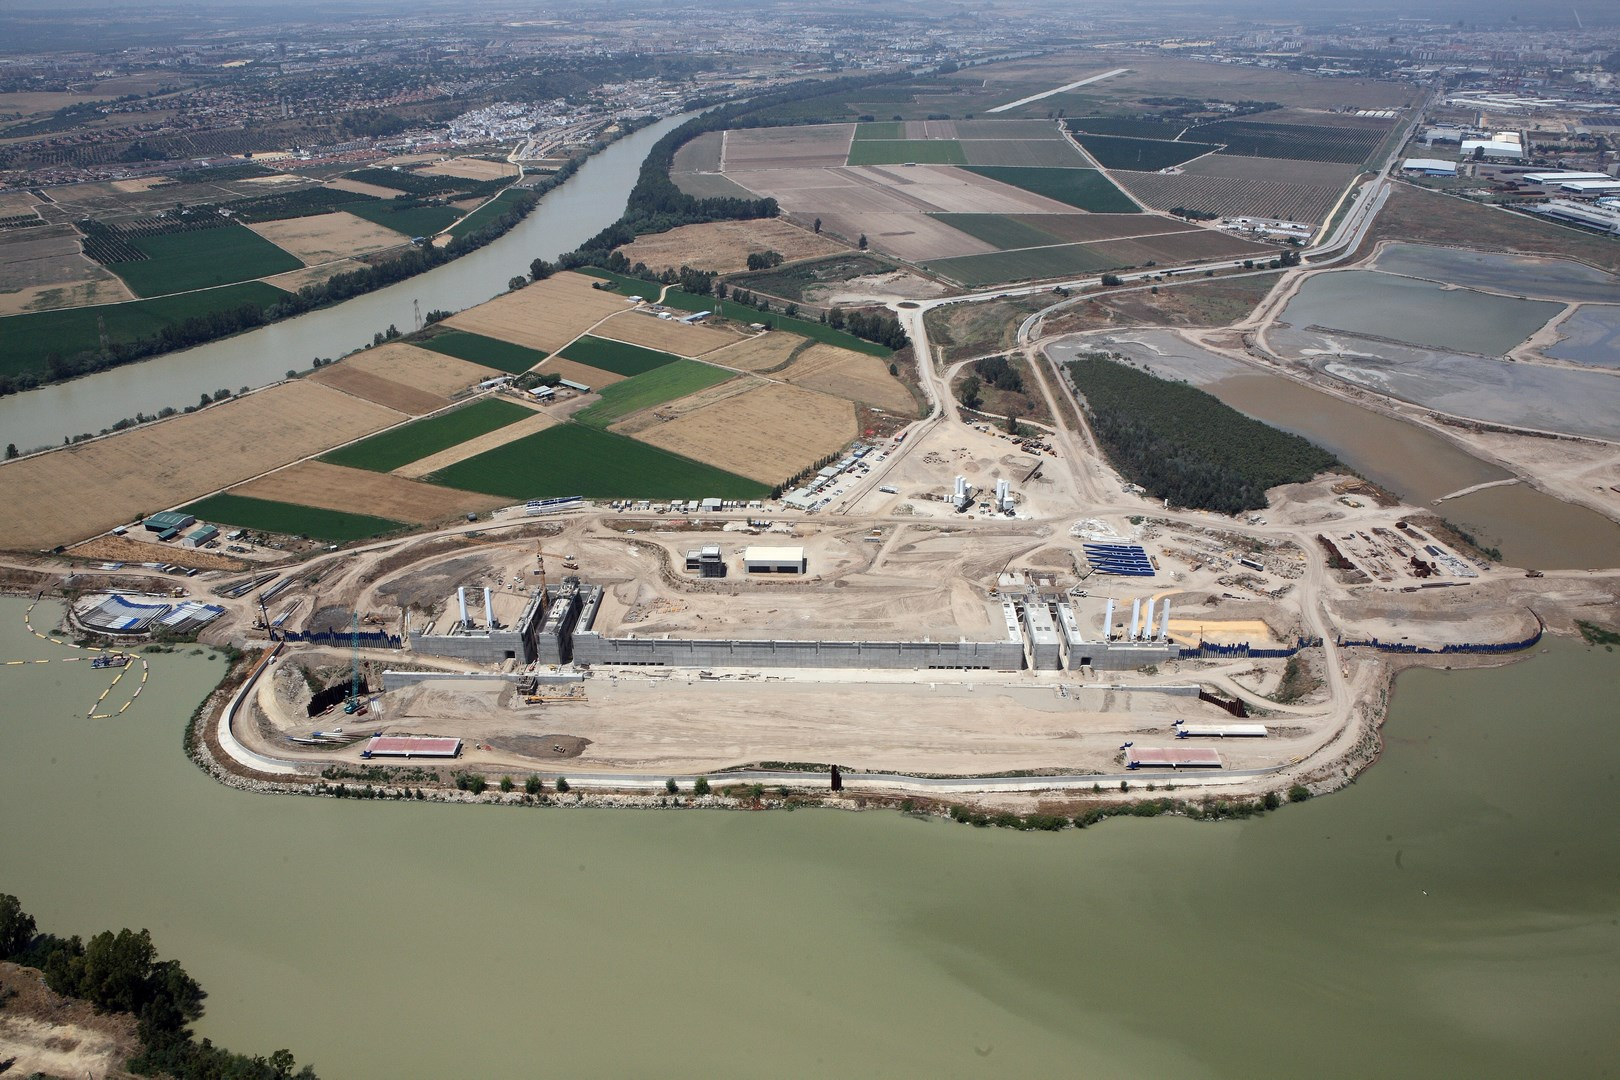 Vista aérea Junio 2009